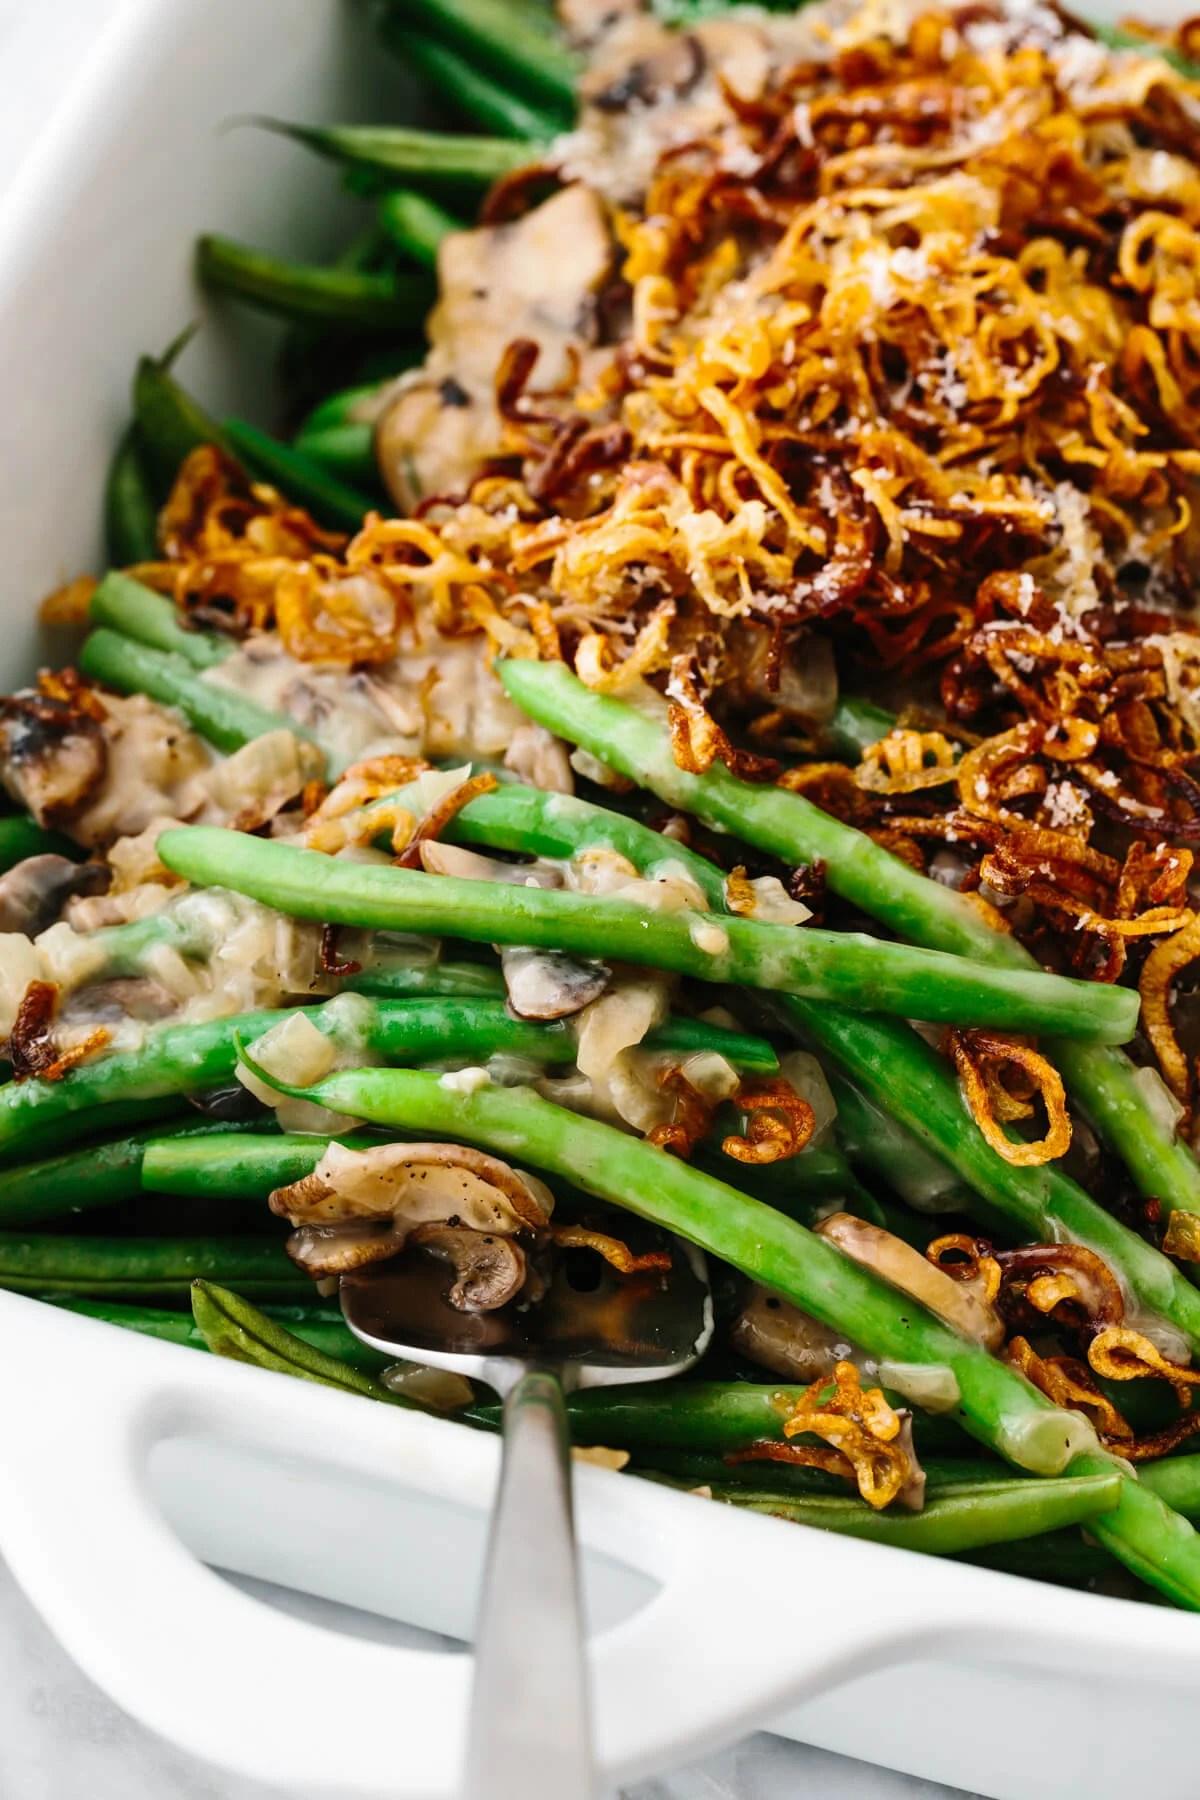 Healthy green bean casserole in a white dish.